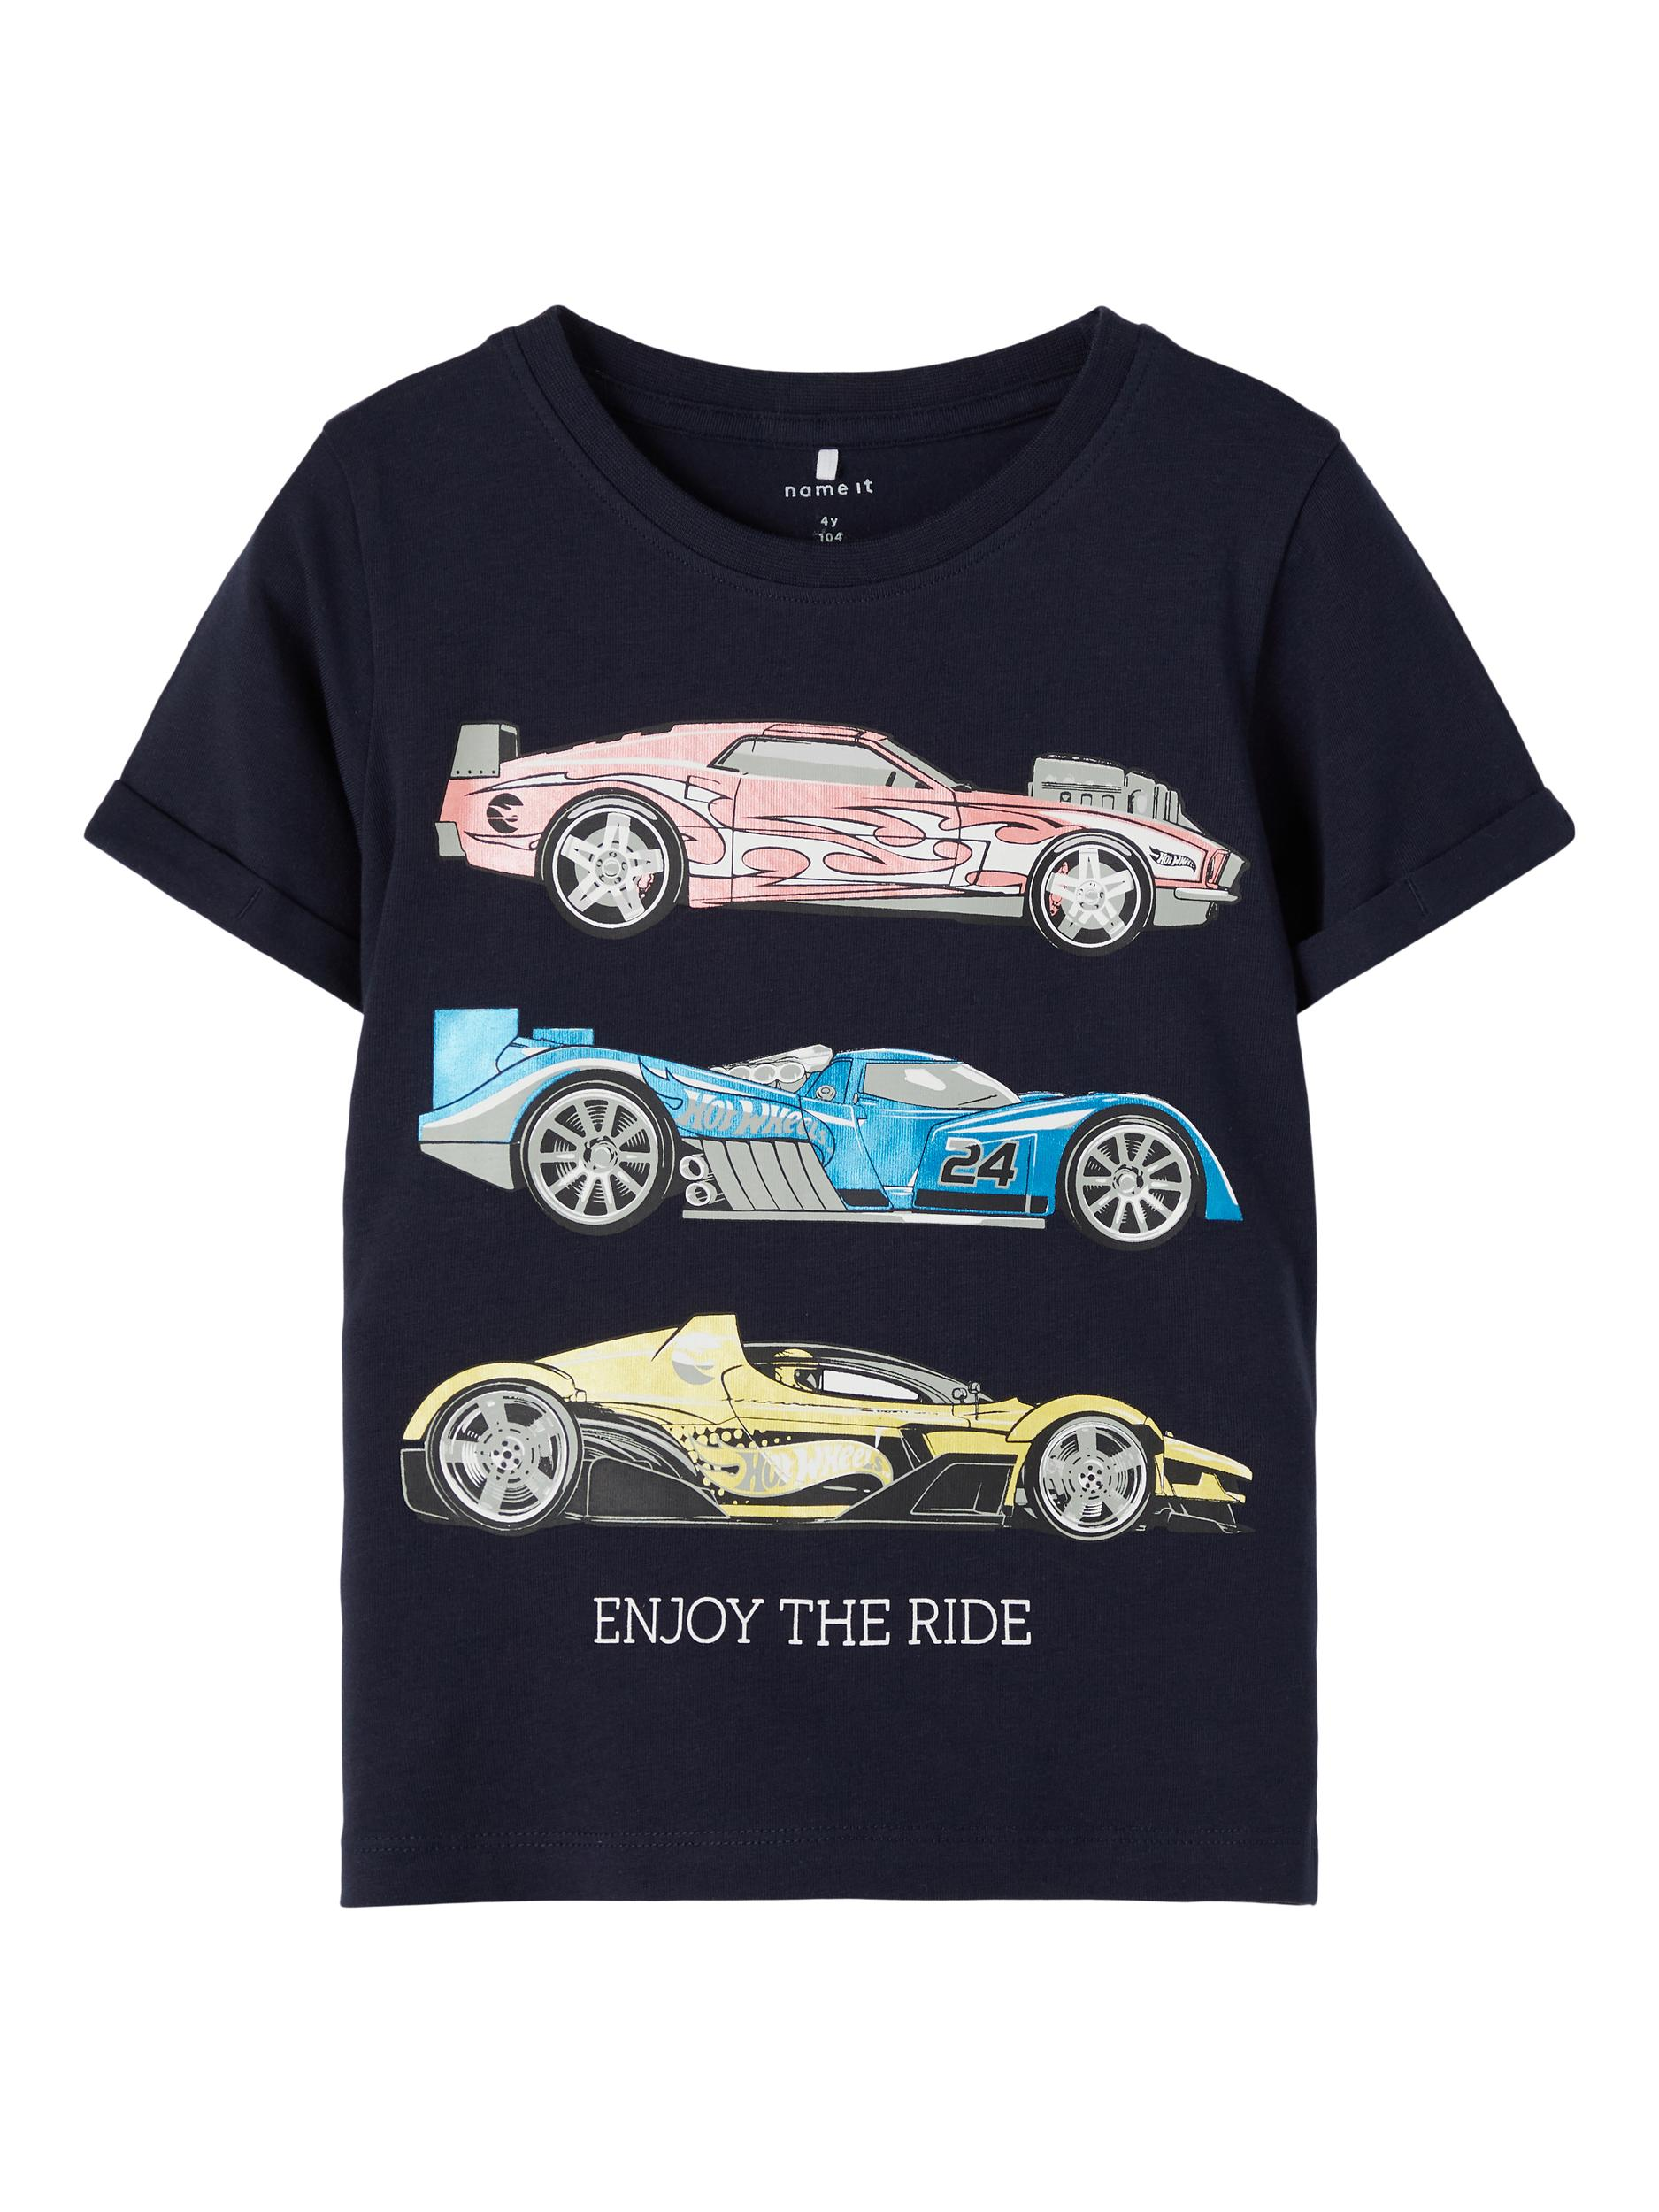 Name It Hot Wheels Evald t-shirt